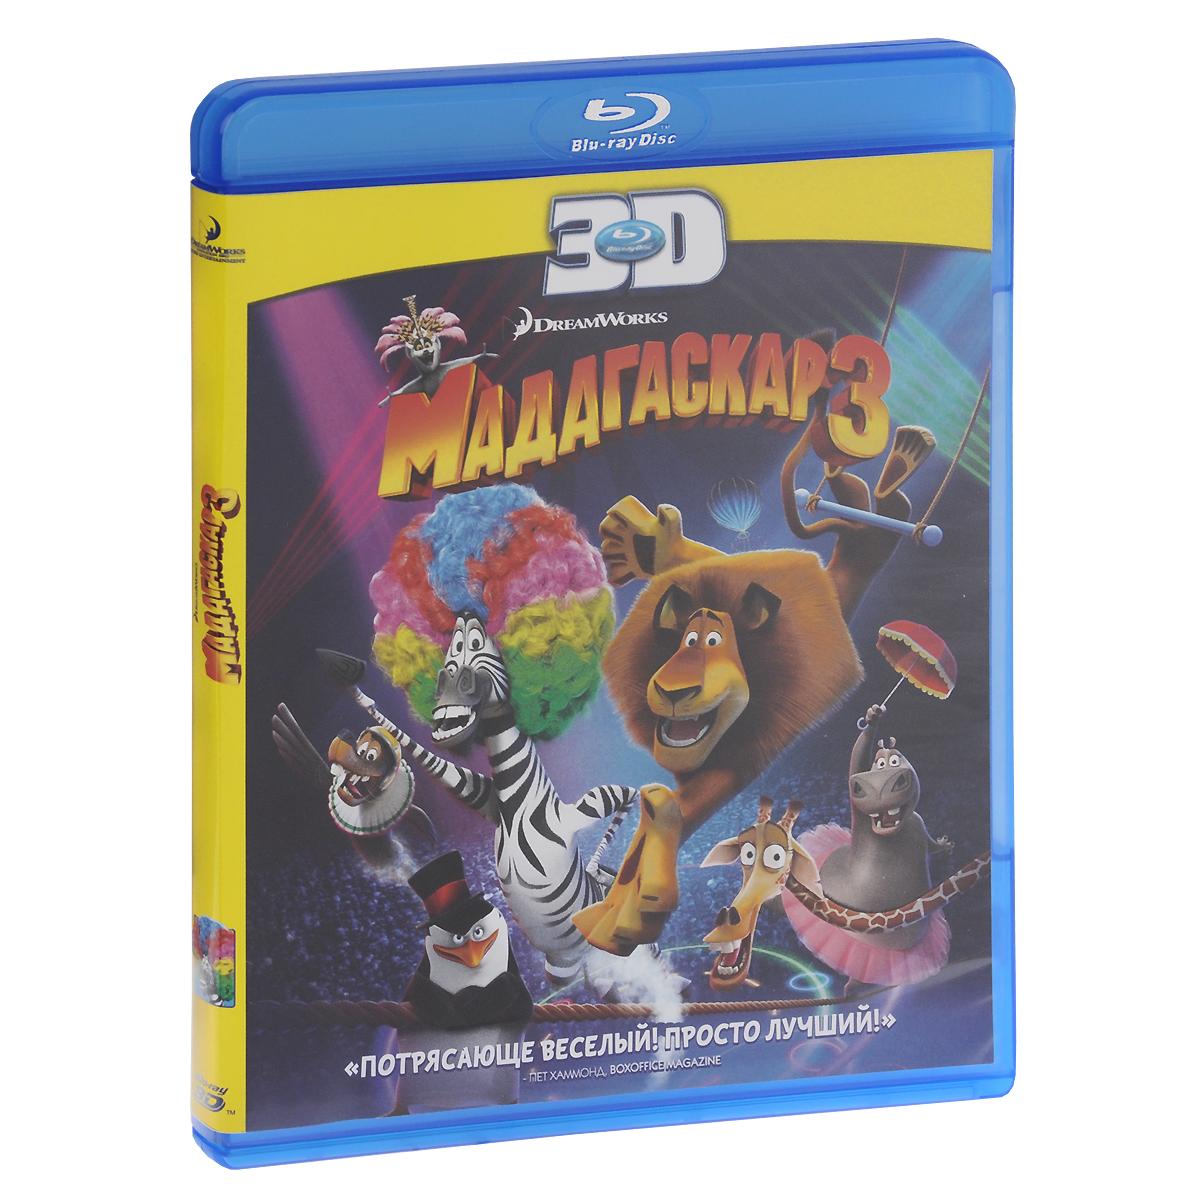 Мадагаскар 3 3D (Blu-ray) мадагаскар 3 3d blu ray